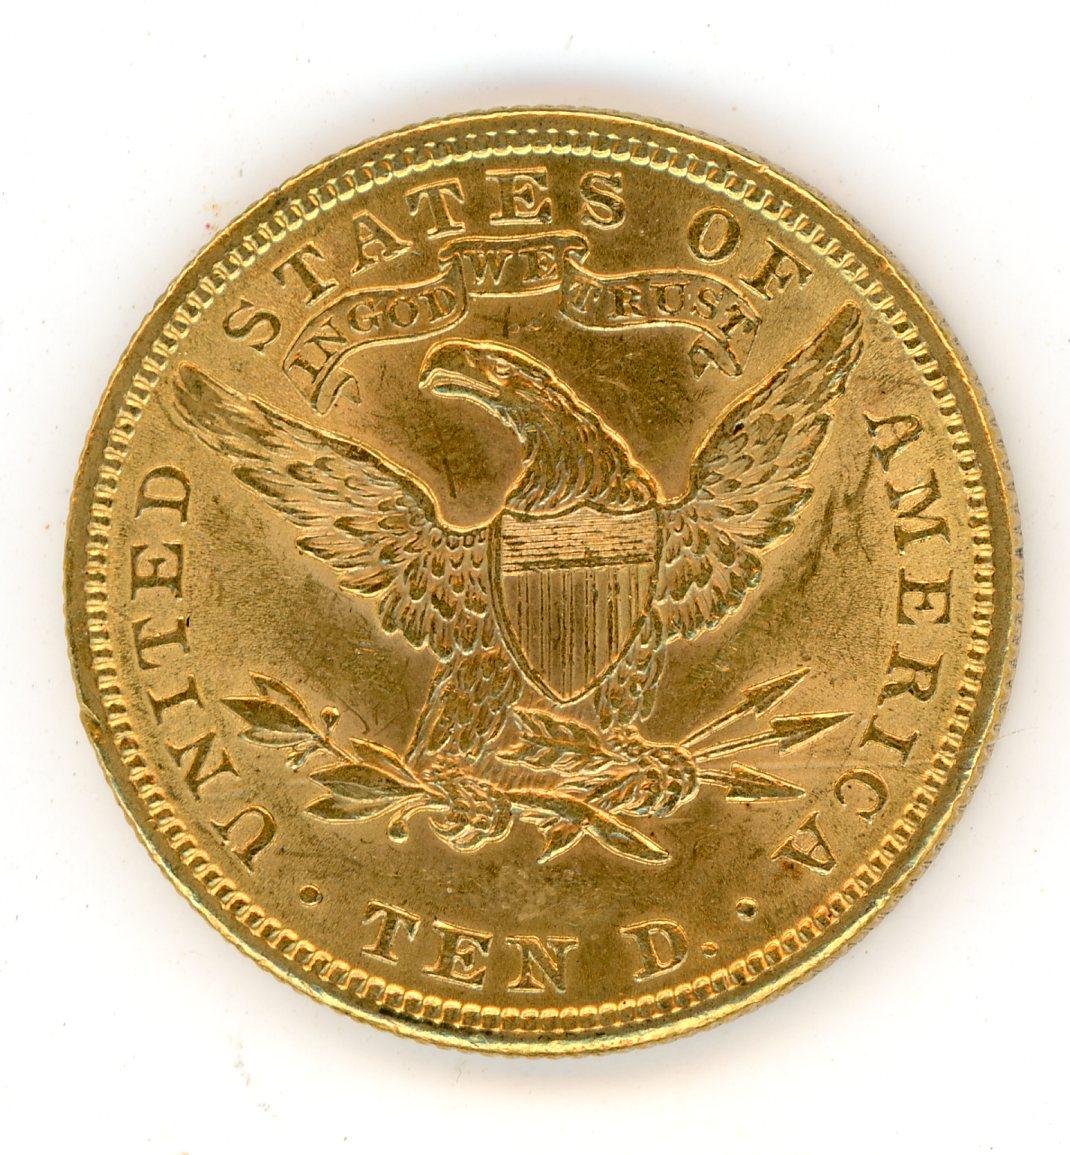 Thumbnail for 1901 United States Coronet Head Gold Ten Dollar